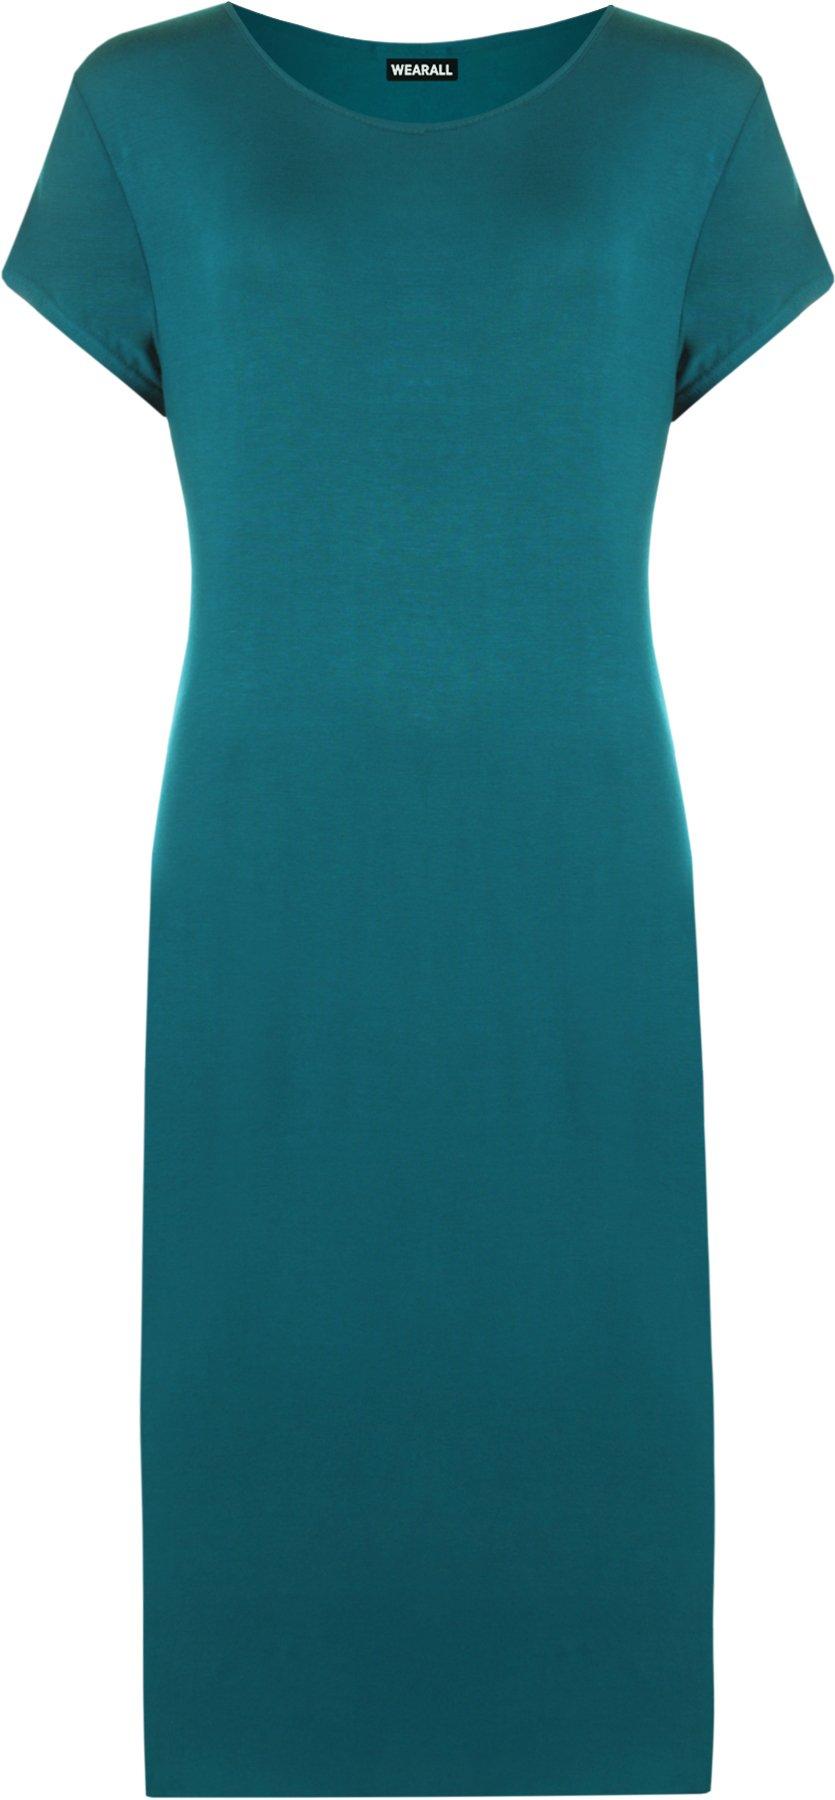 WearAll Women's Plus Size Plain Midi Dress - Teal - US 12-14 (UK 16-18)